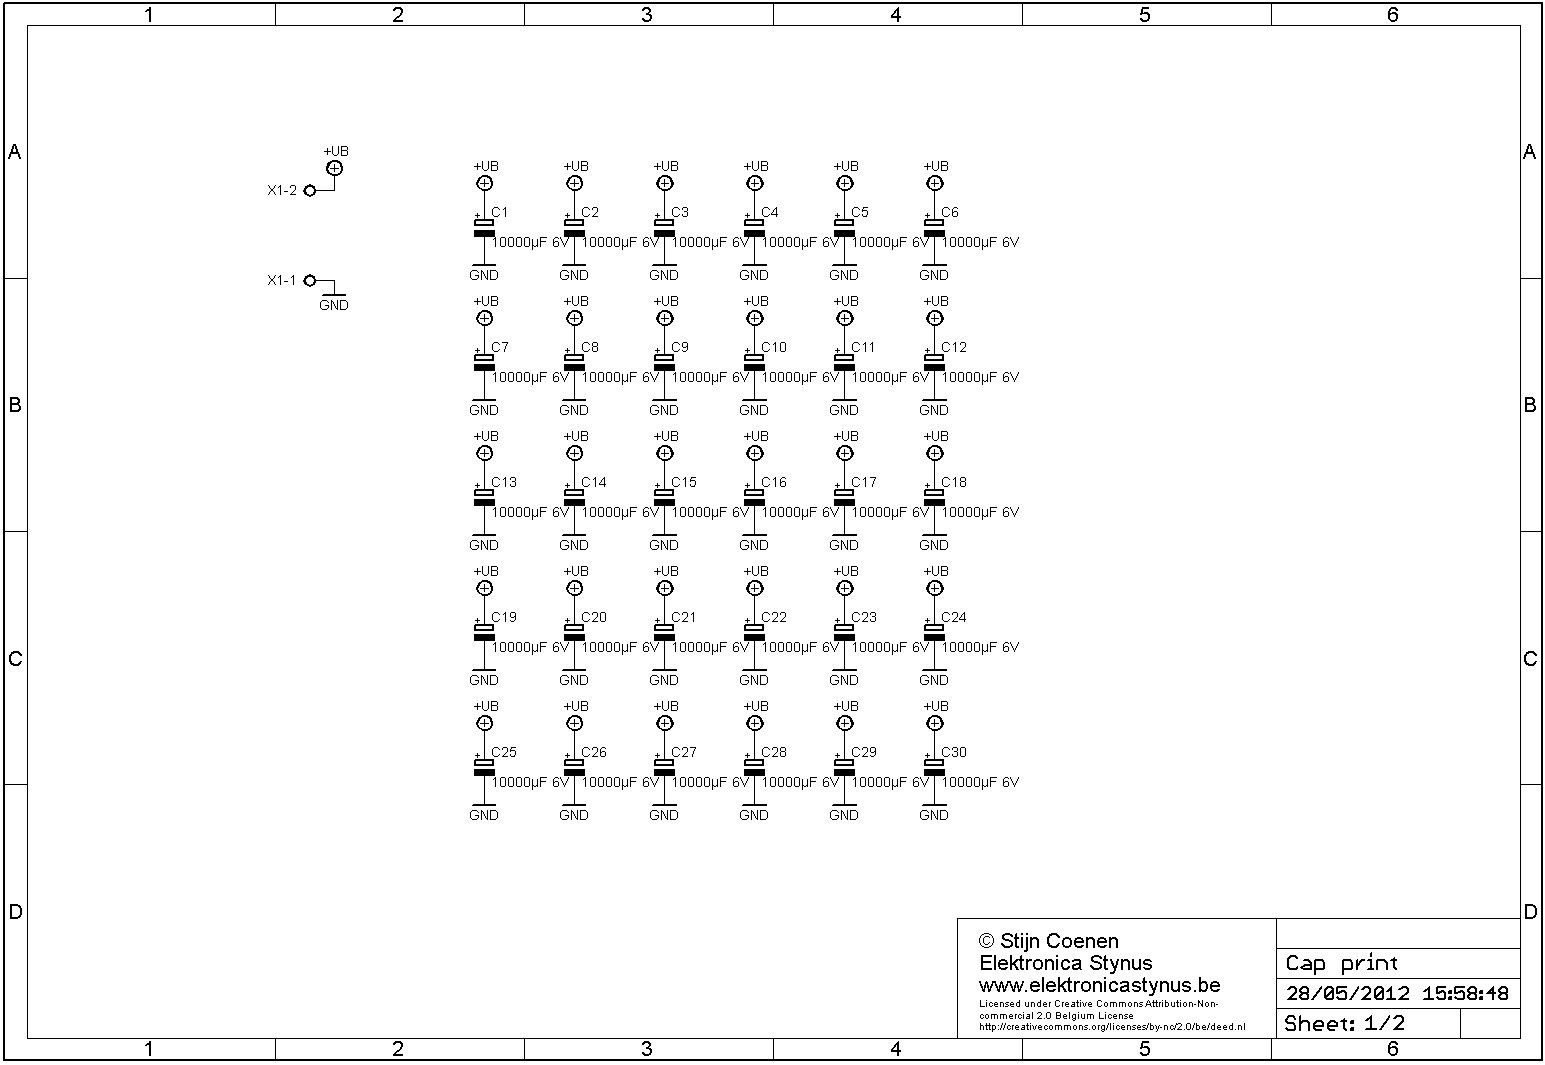 http://image.elektronicastynus.be/82/Schema_Cap_Print.png